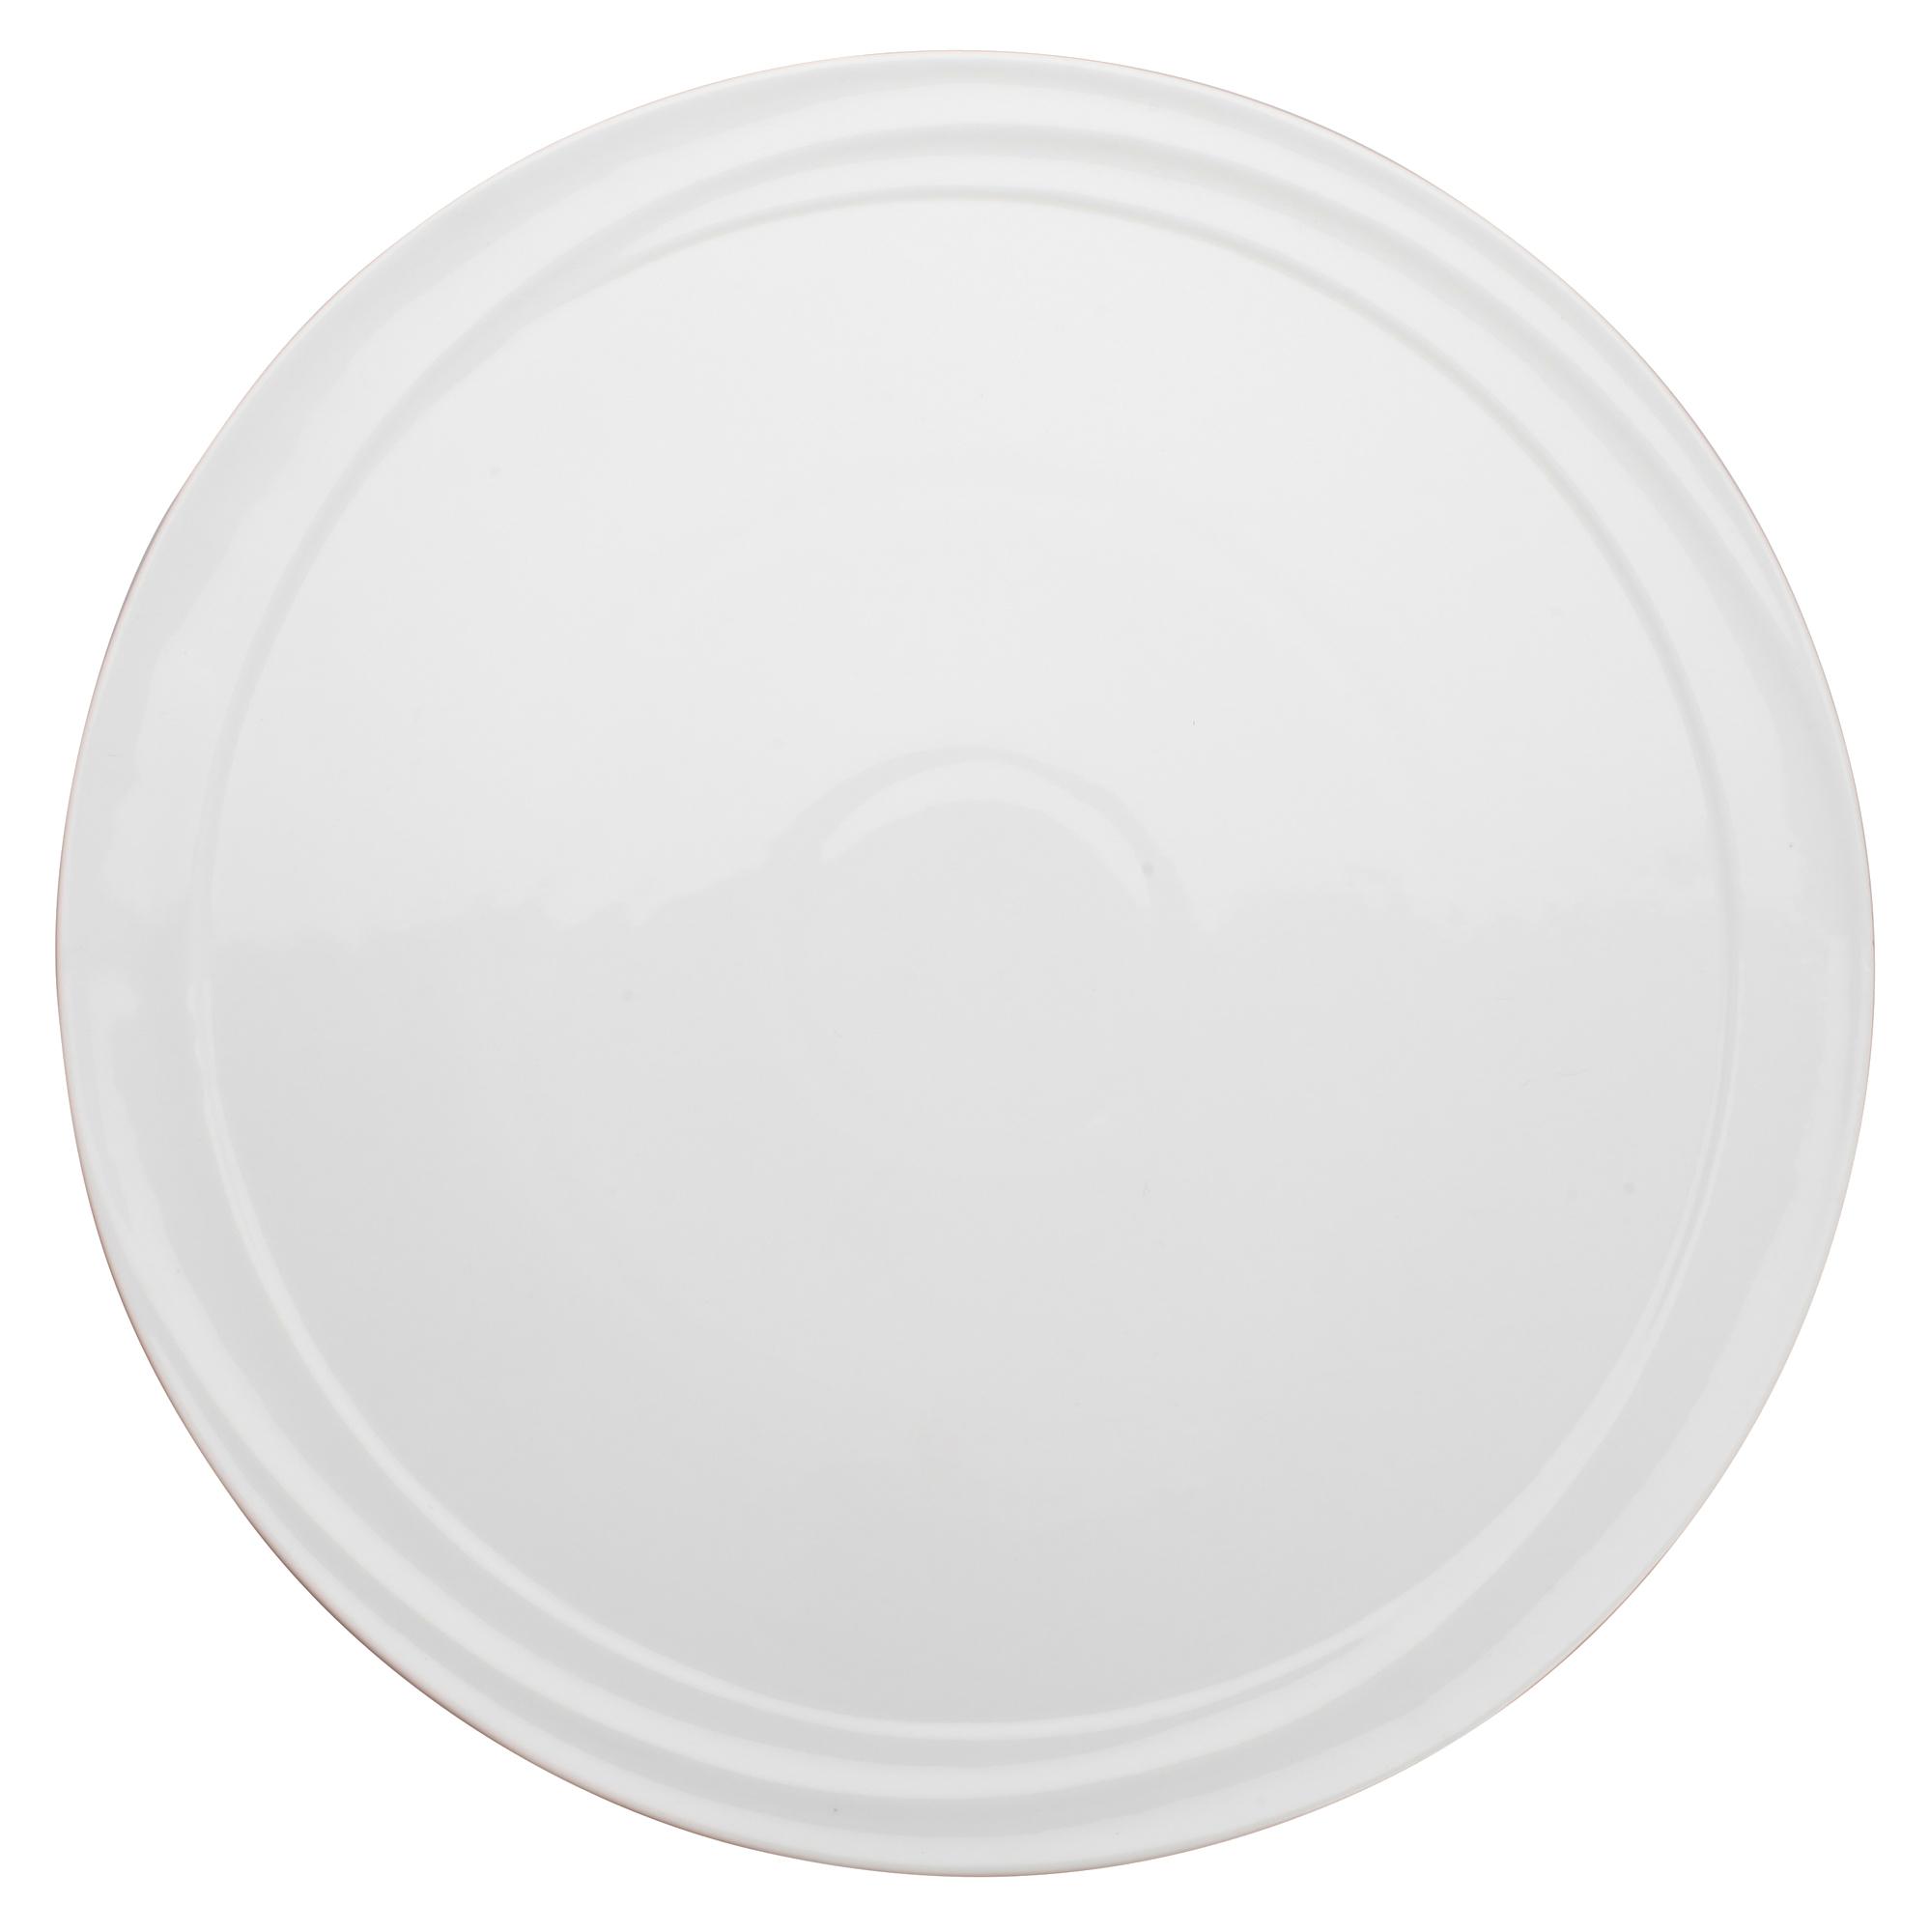 Winco WDP007-102 plate, china